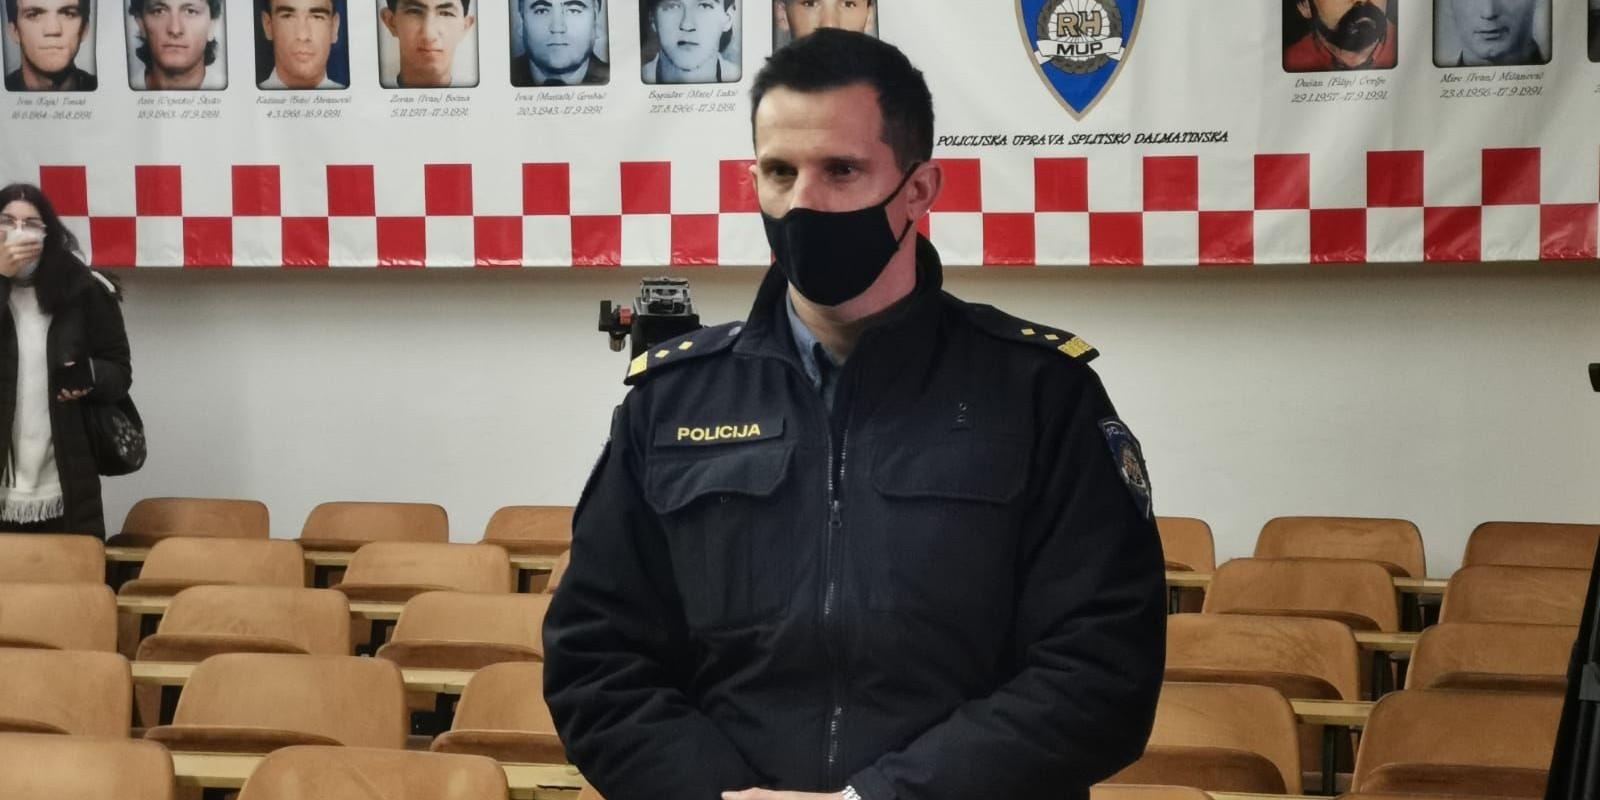 FOTO/VIDEO: DOBIO OTKAZ Disciplinski sud načelniku Matku Klariću dosudio prestanak državne službe